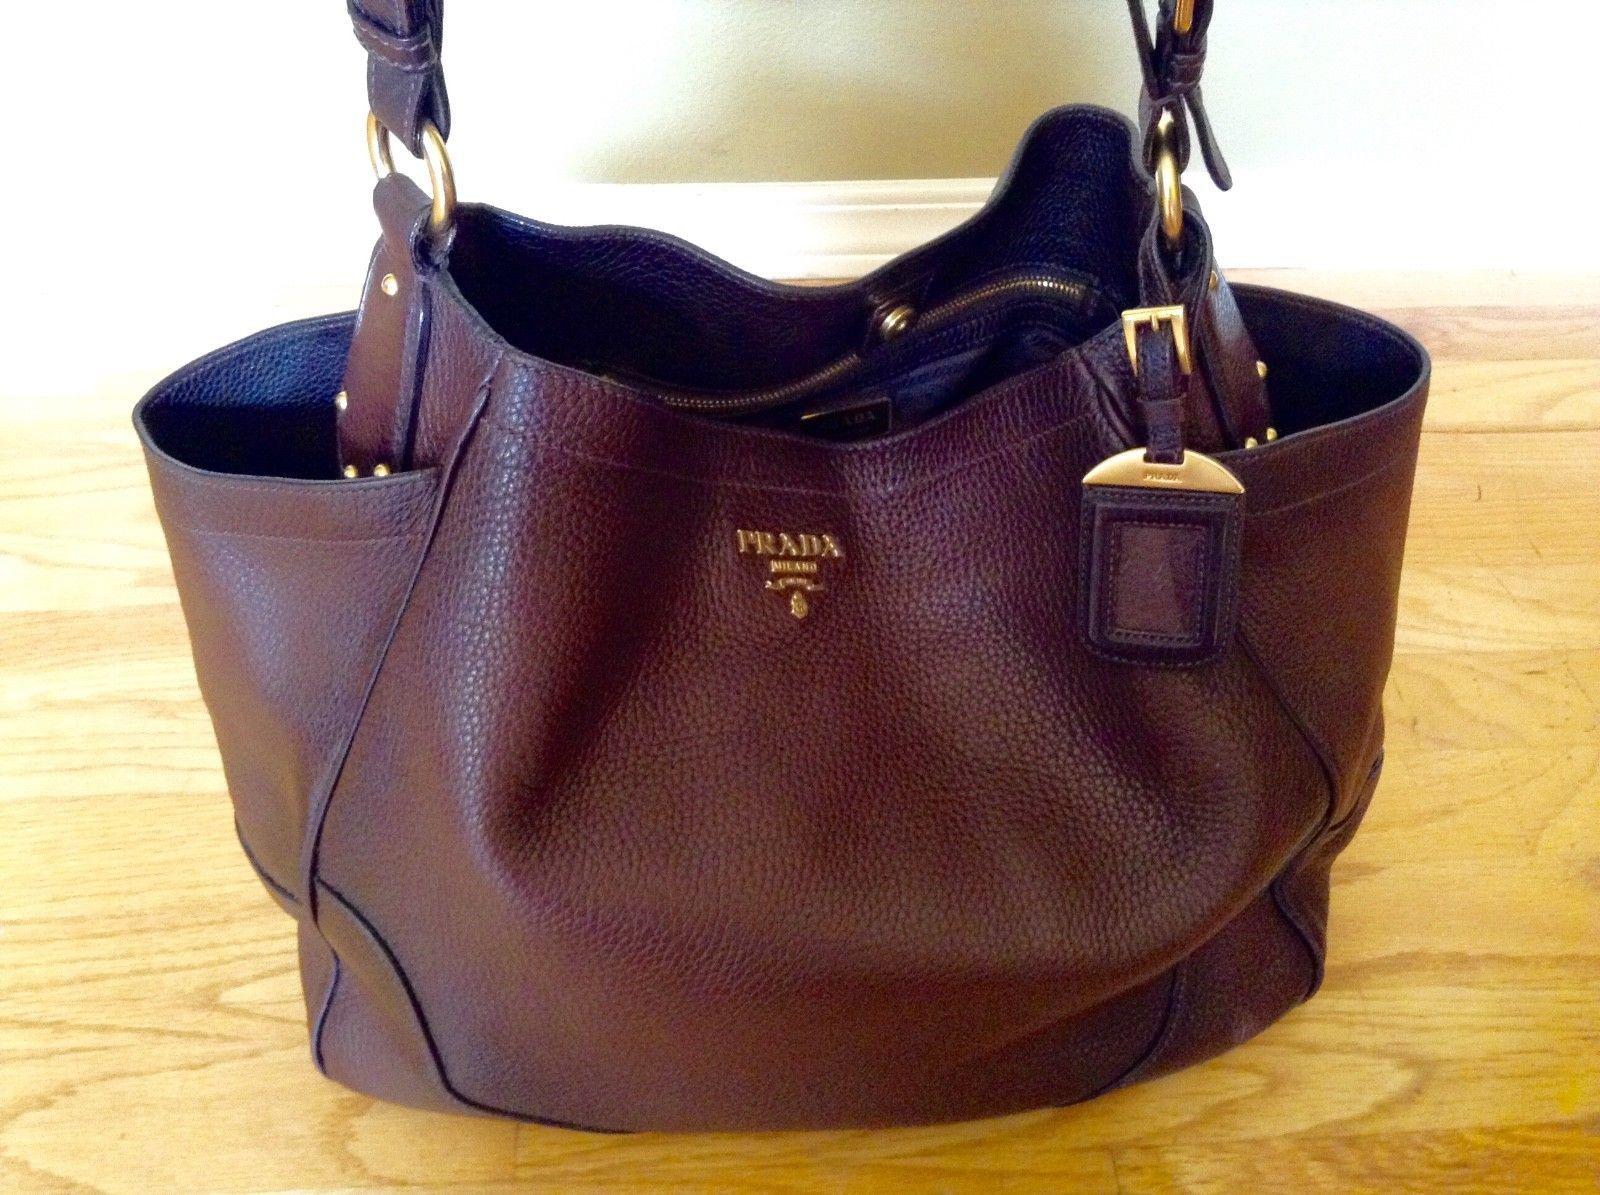 f3dea92a332b ... authentic auth prada gradient brown vitello daino pebble jumbo satchel tote  shoulder bag 745.0 0b9ef d8a7f ...